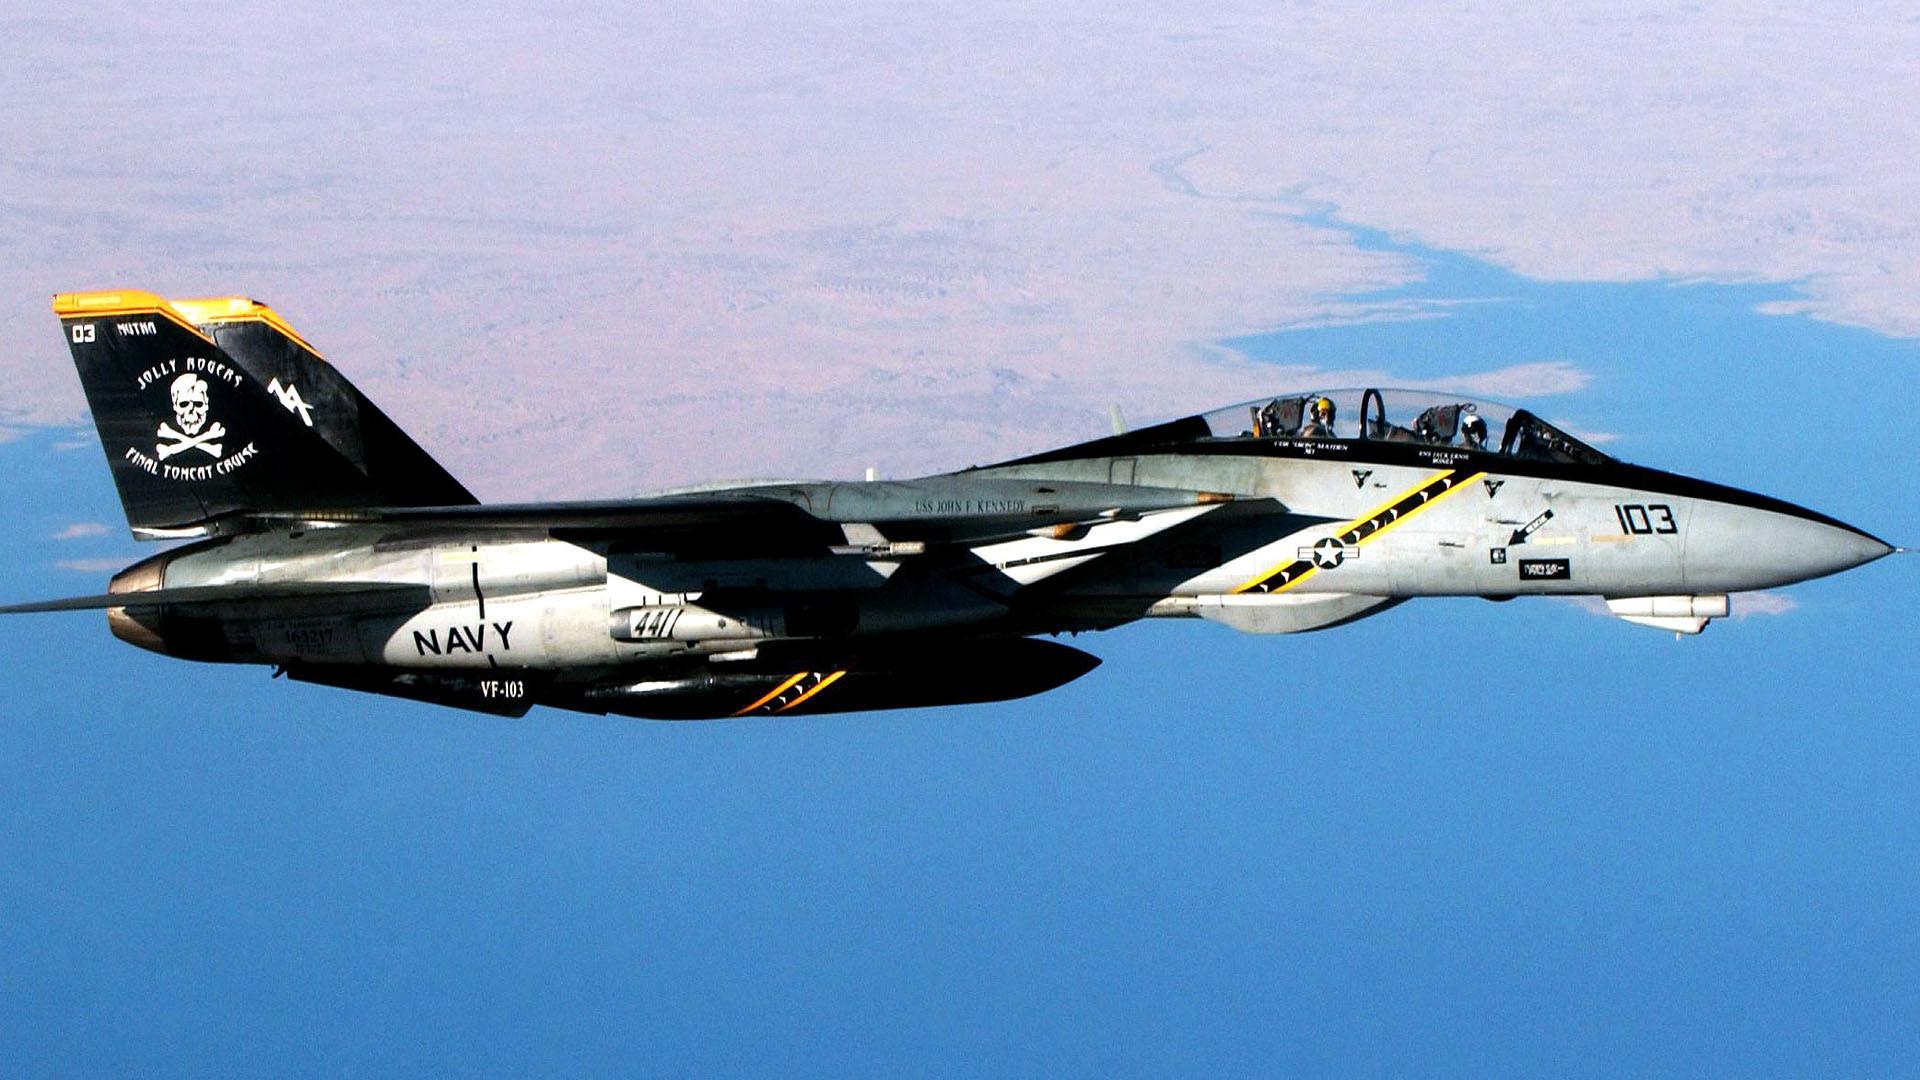 F 14 Tomcat Jolly Rogers Military Aircraft Wallpaper Wallpaper